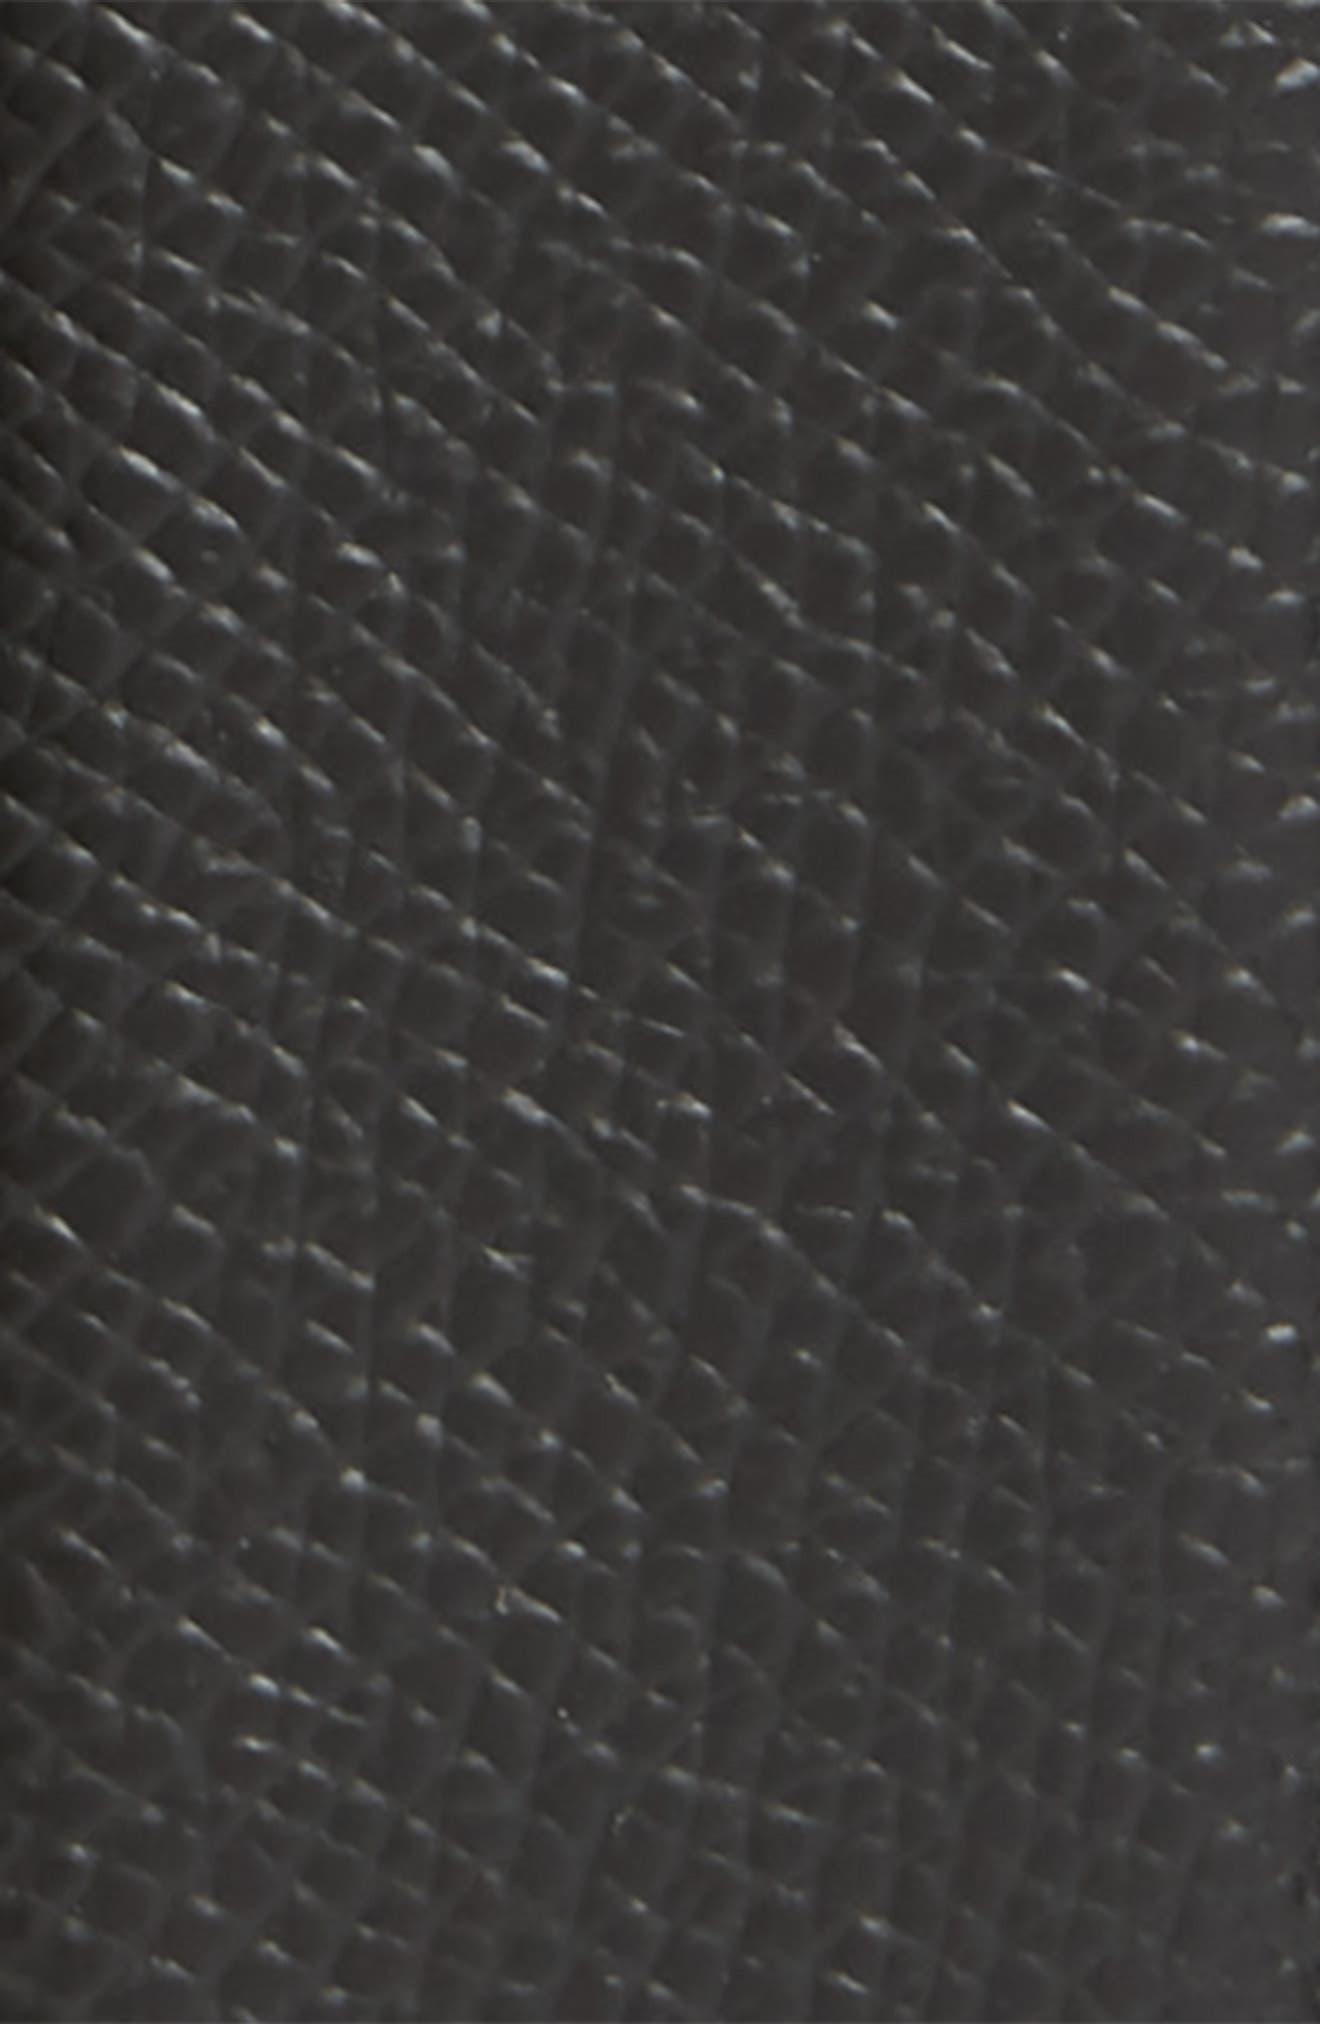 SALVATORE FERRAGAMO, Reversible Leather Belt, Alternate thumbnail 3, color, NERO / T.MORO